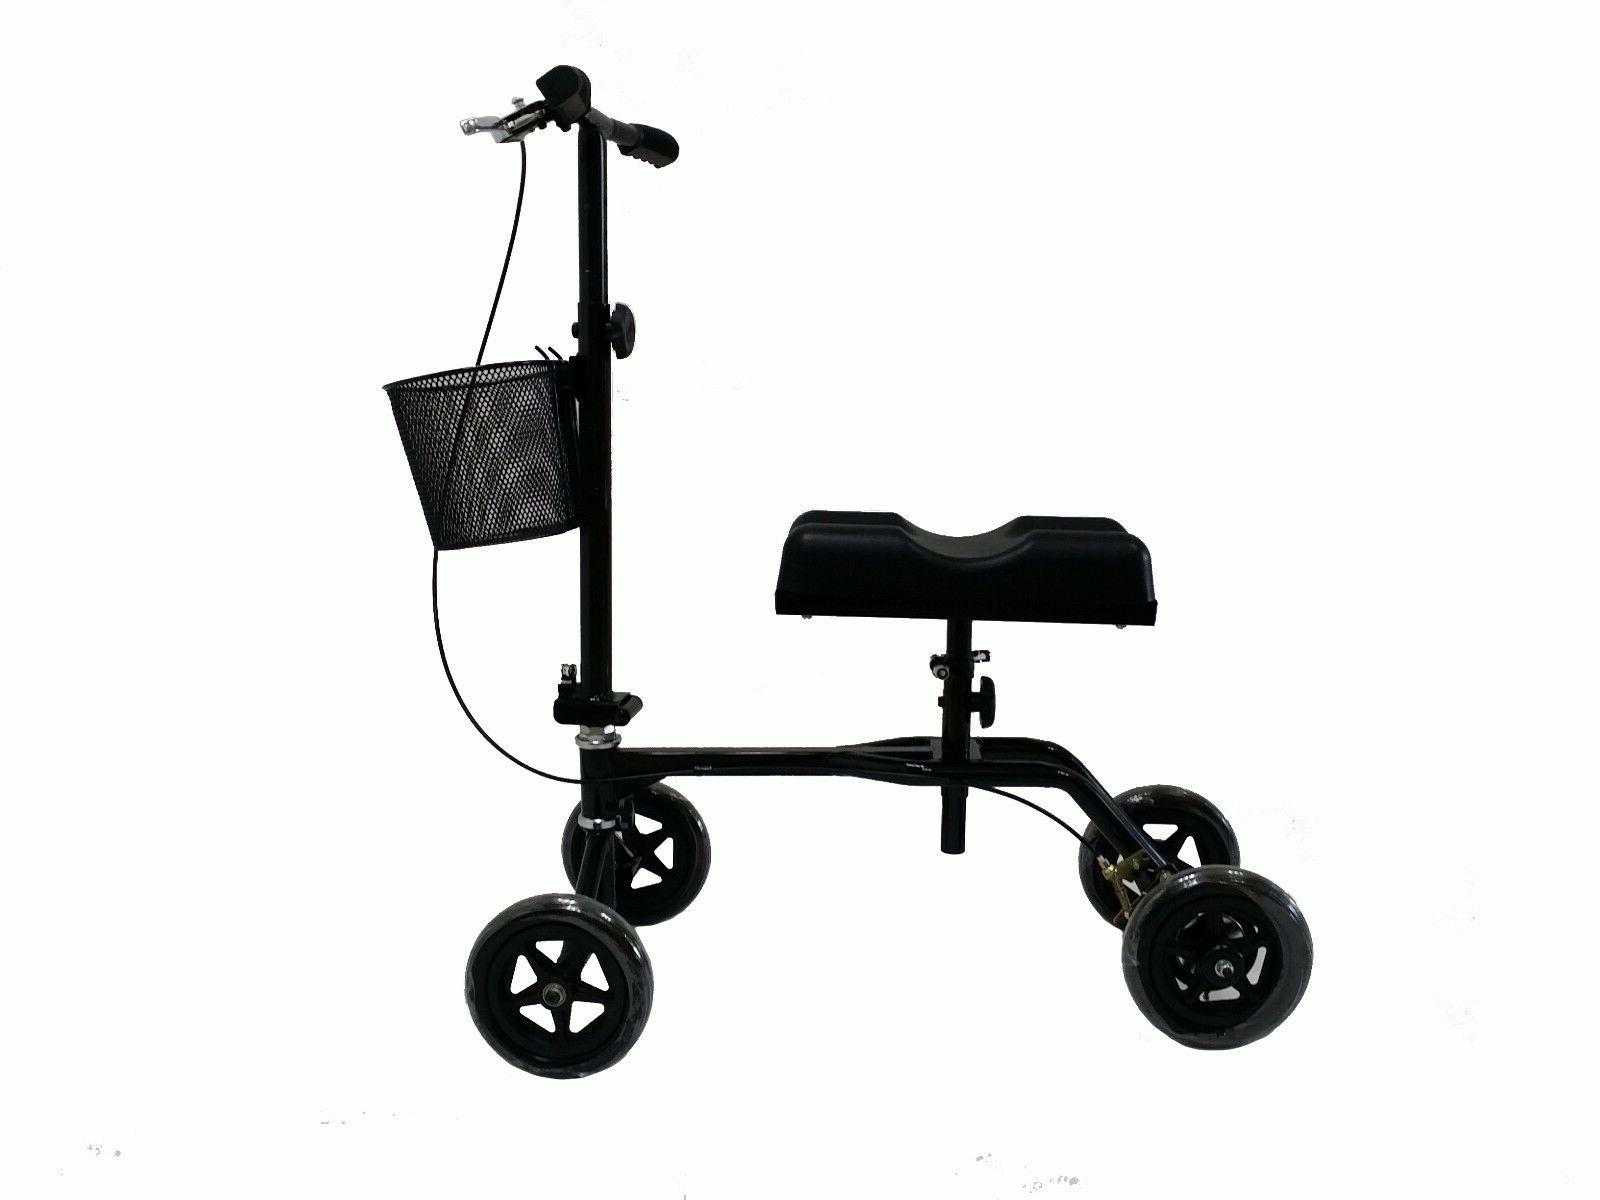 New Steerable Knee Scooter Turning Brake Basket